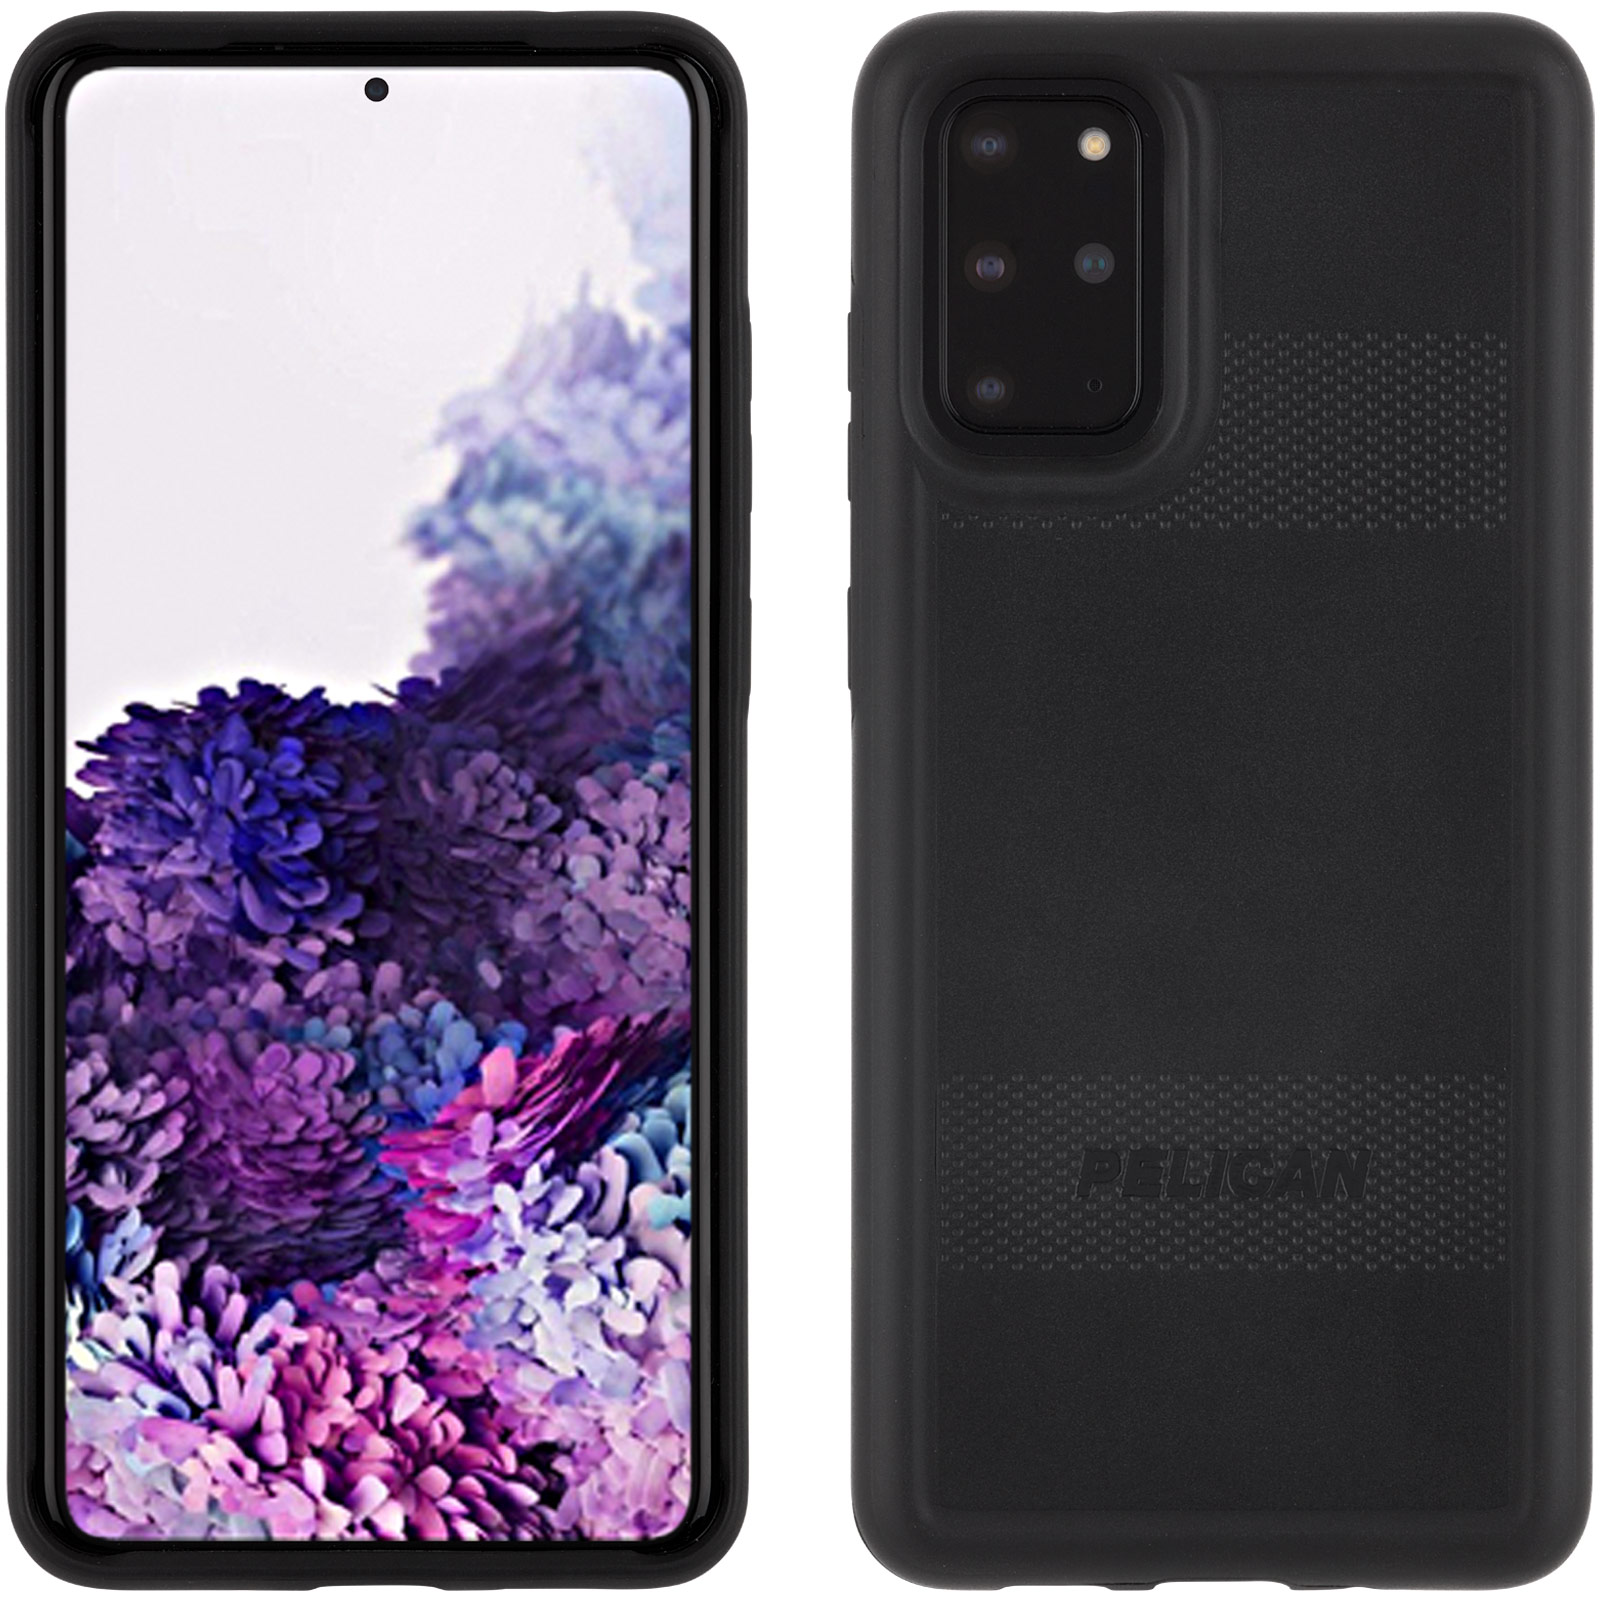 pelican pp042598 protector samsung phone case black s20 plus